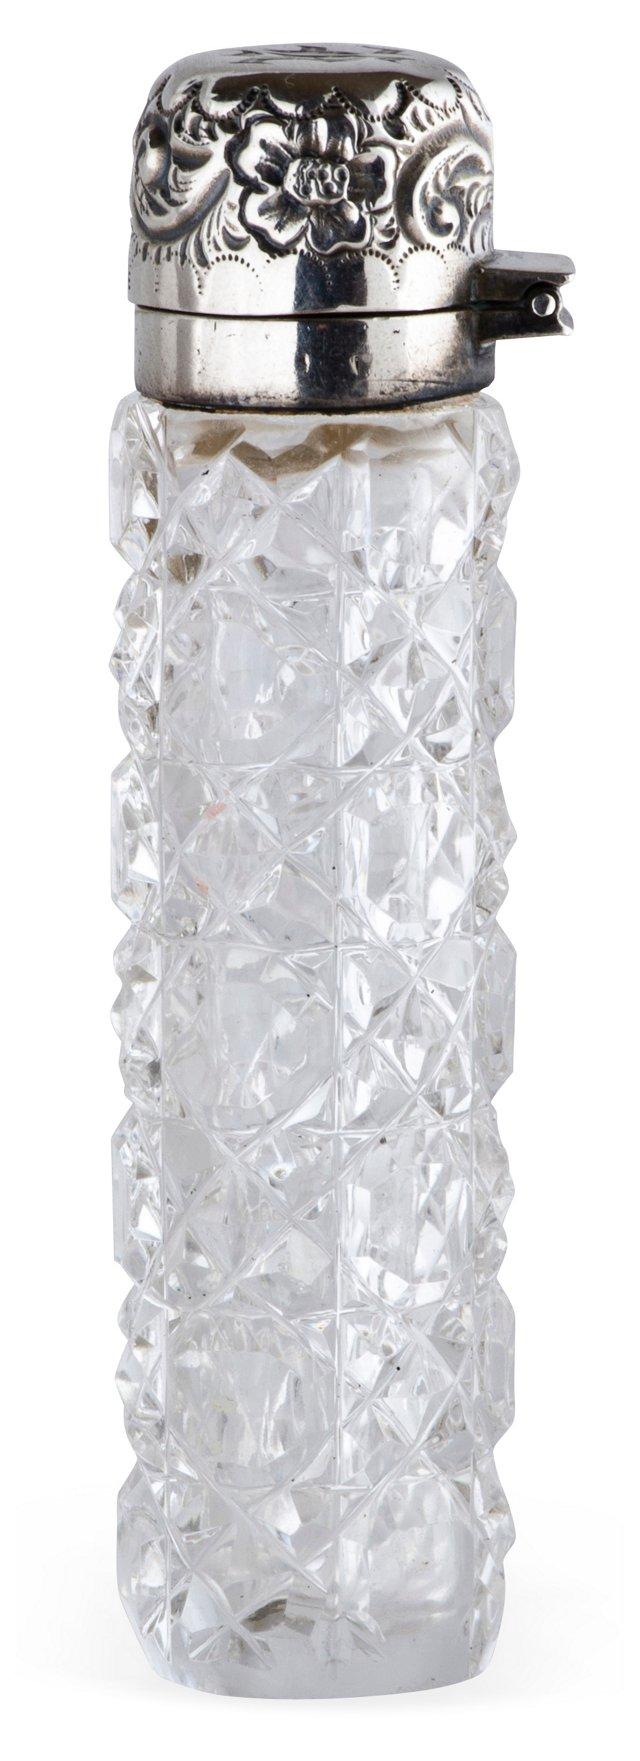 19th-C. Cut-Crystal Sterling Perfume